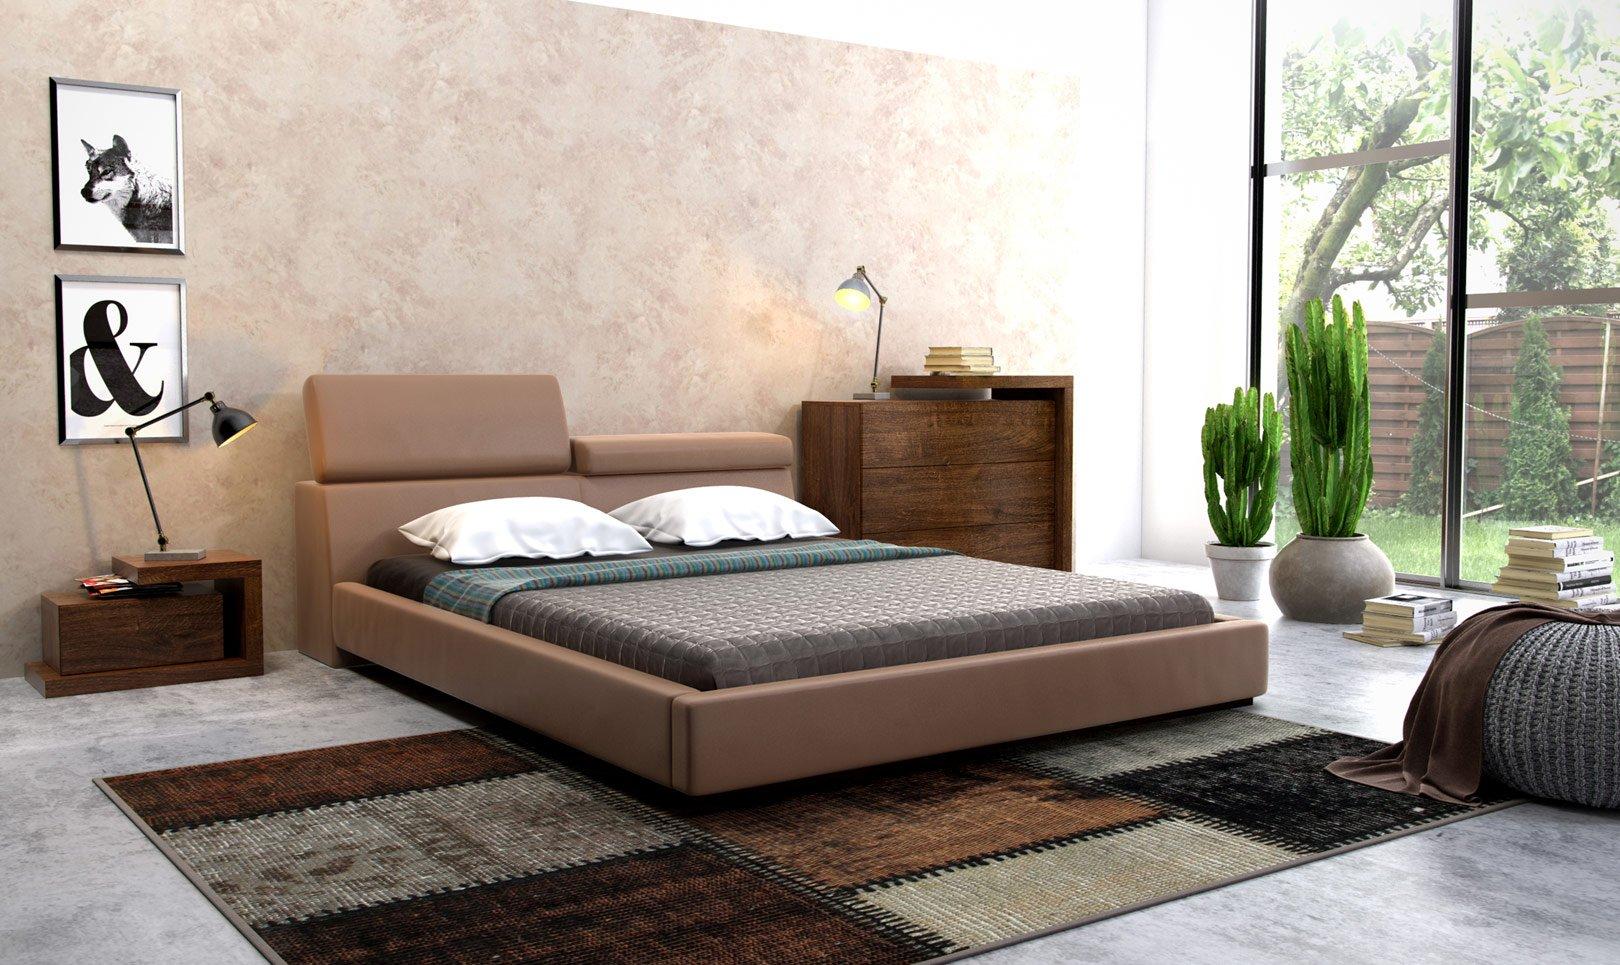 meble do sypialni elegance krak243w warszawa katowice